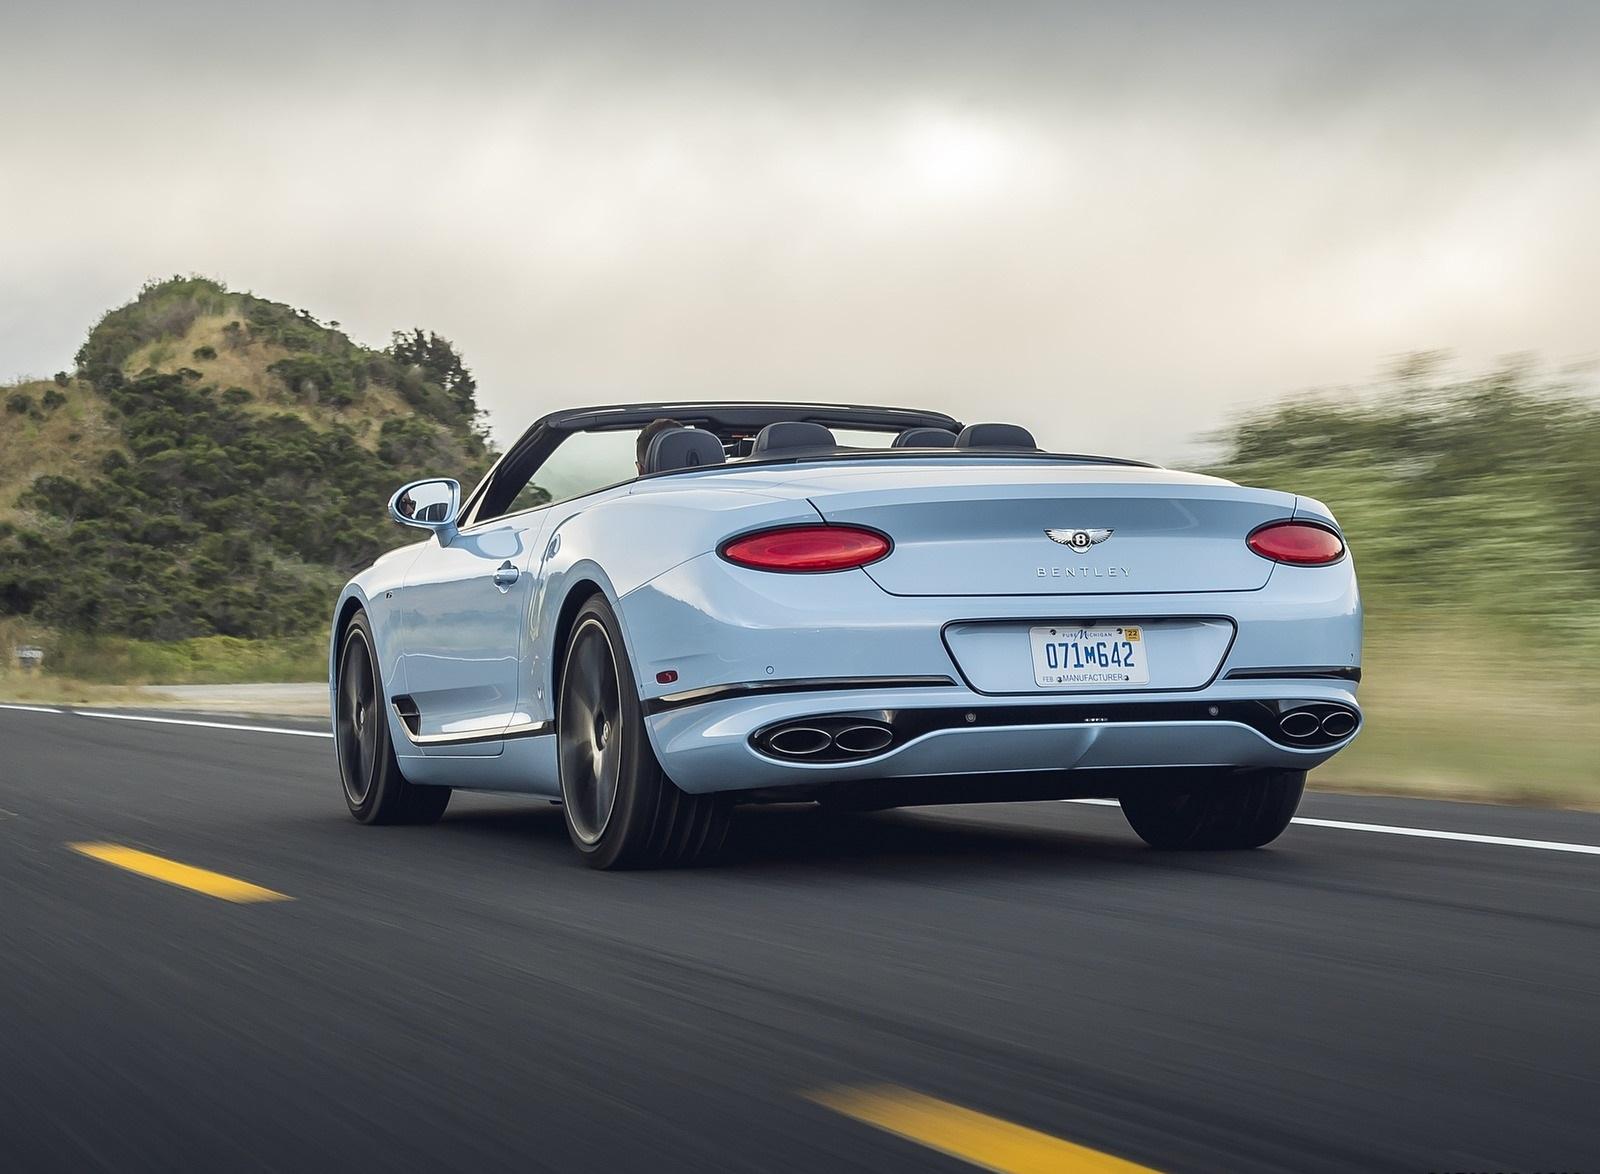 2020 Bentley Continental GT V8 Convertible Rear Three-Quarter Wallpapers (11)